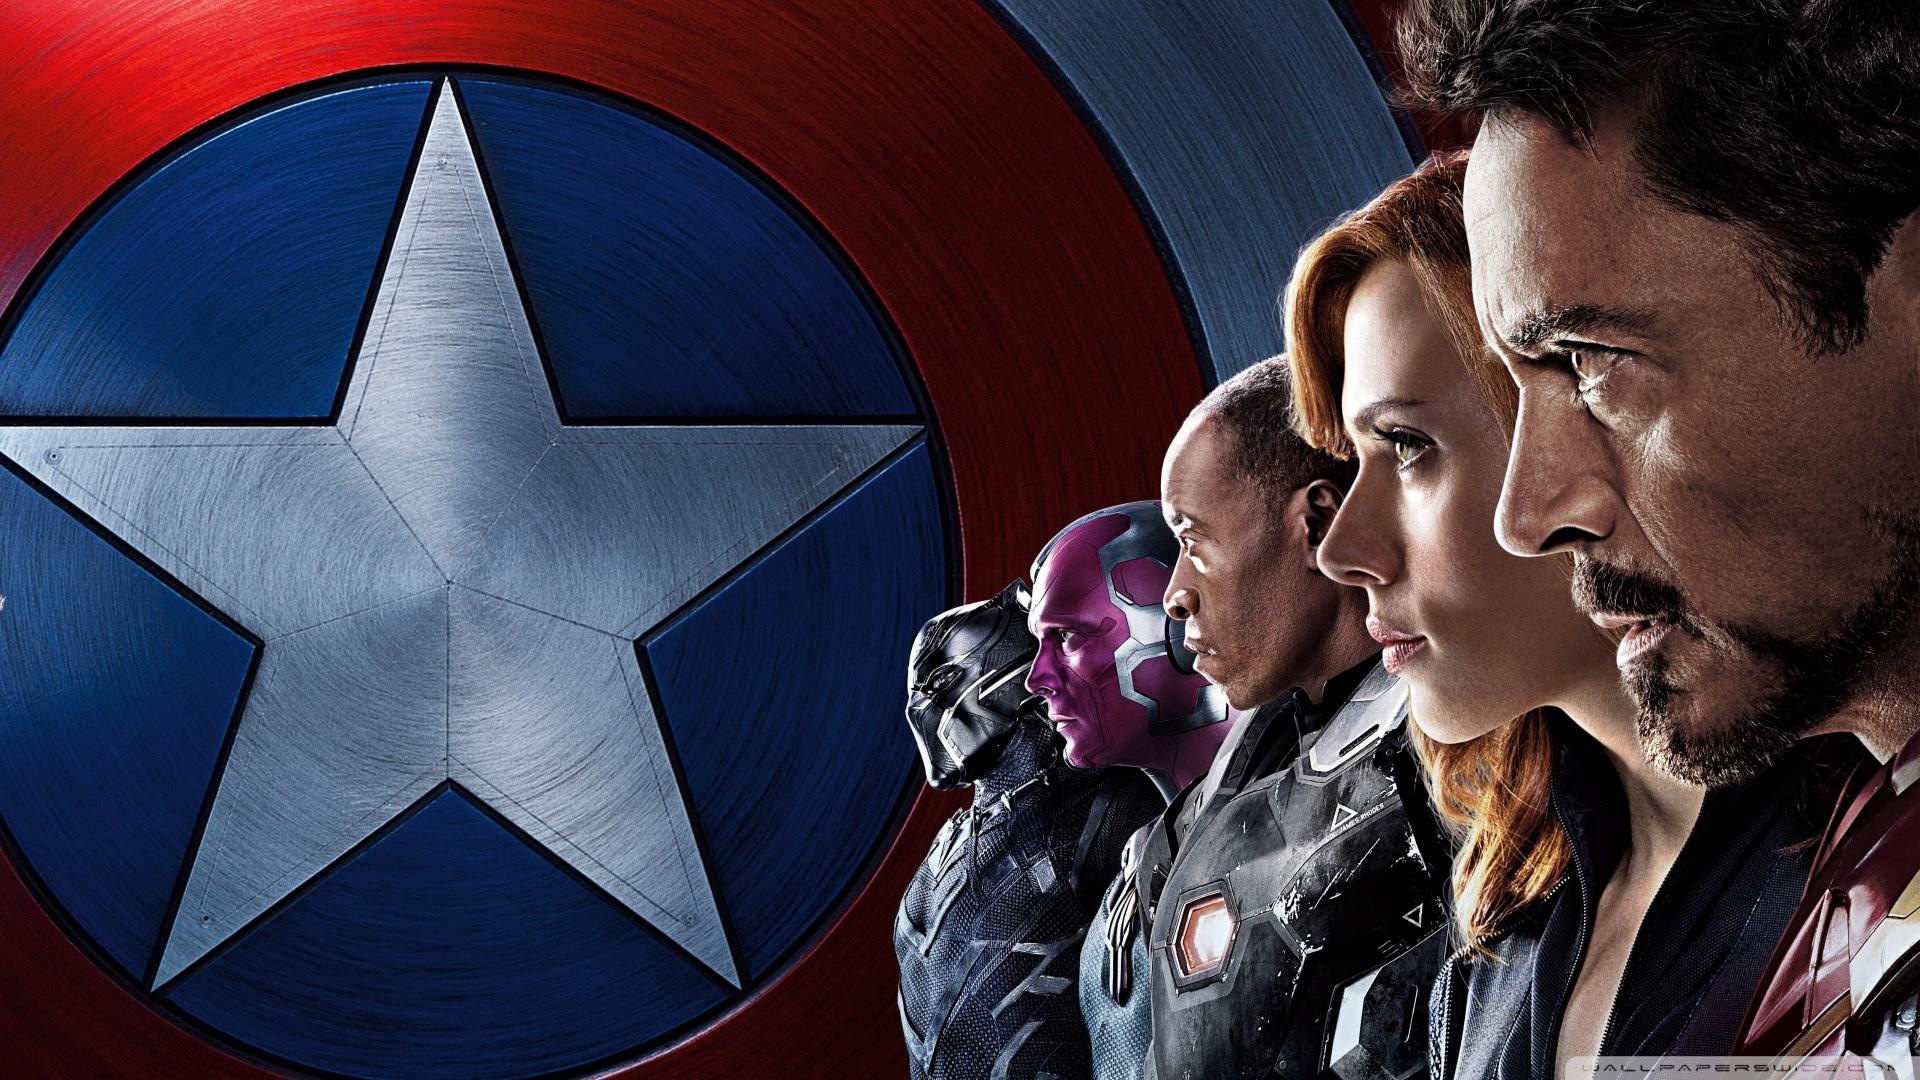 Iron Man Team Captain America Civil War Wallpaper 39903878